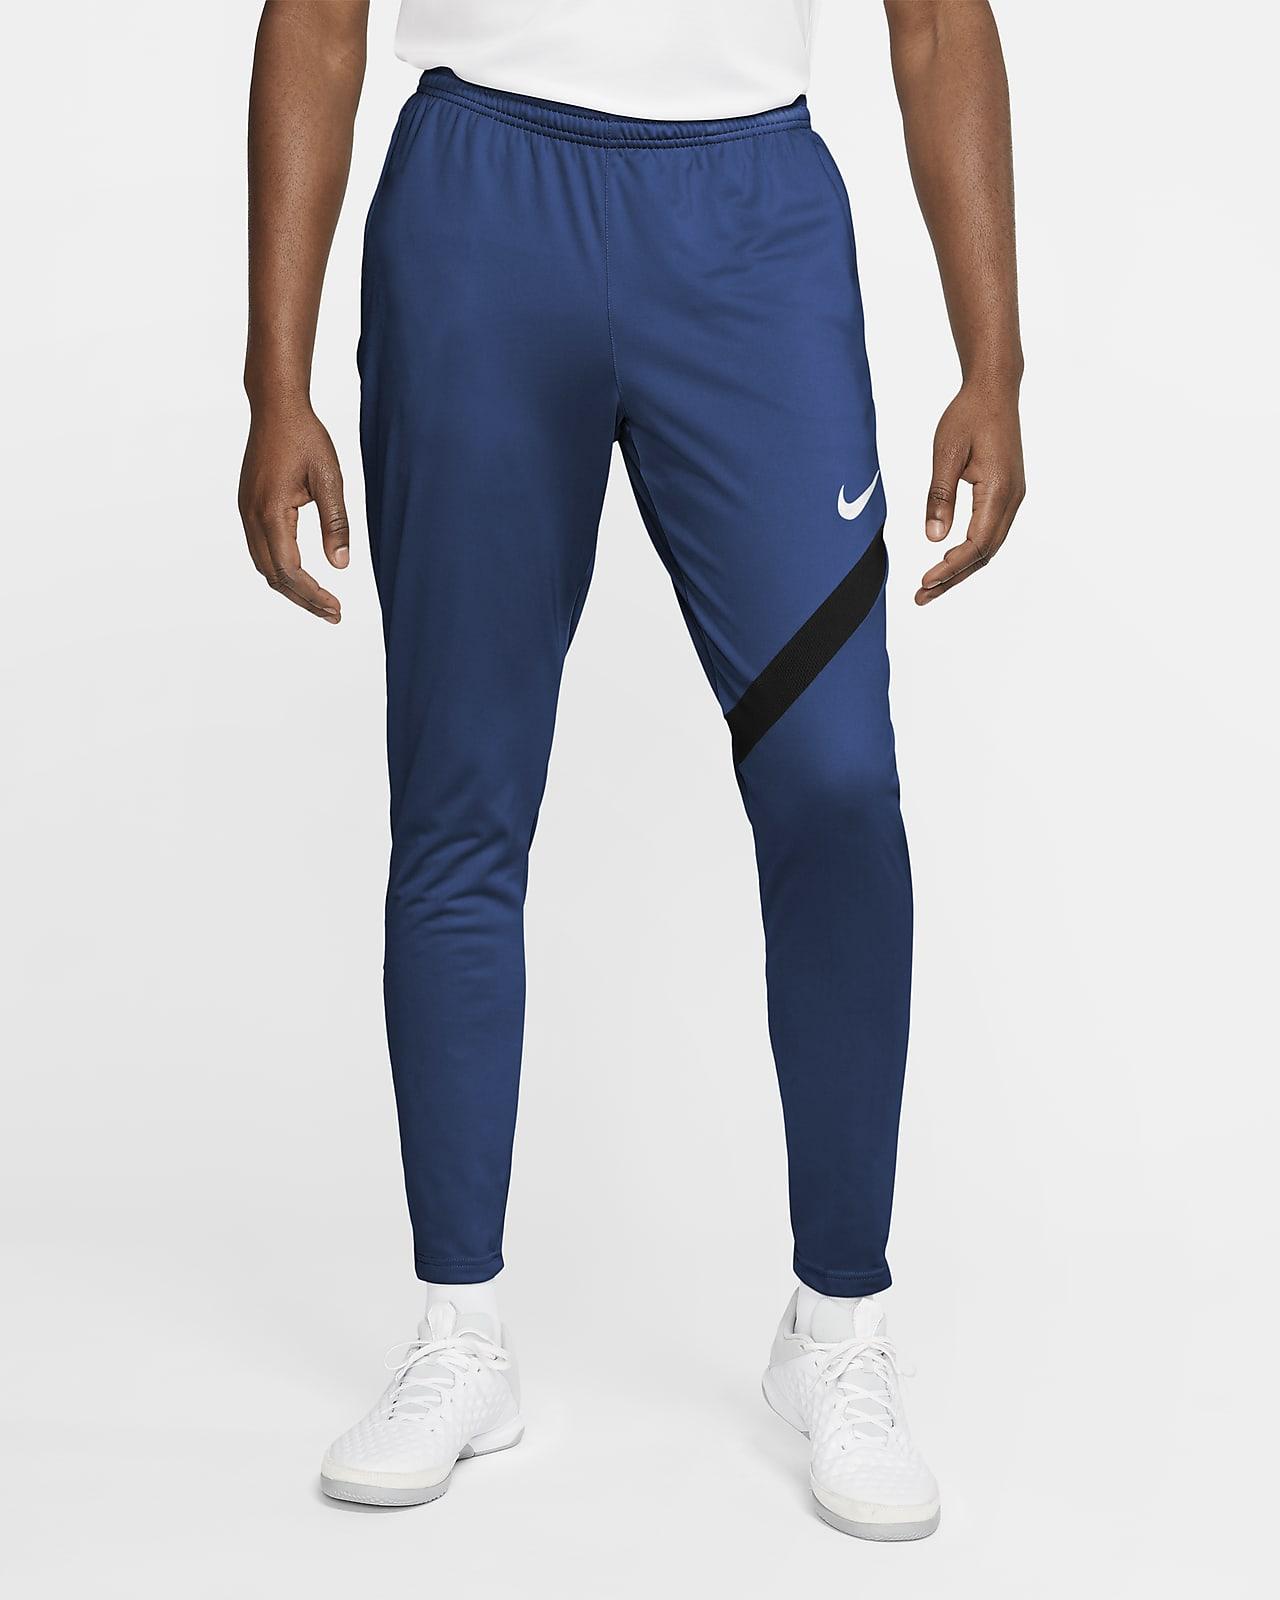 Nike Dri-FIT Academy Pro férfi futballnadrág